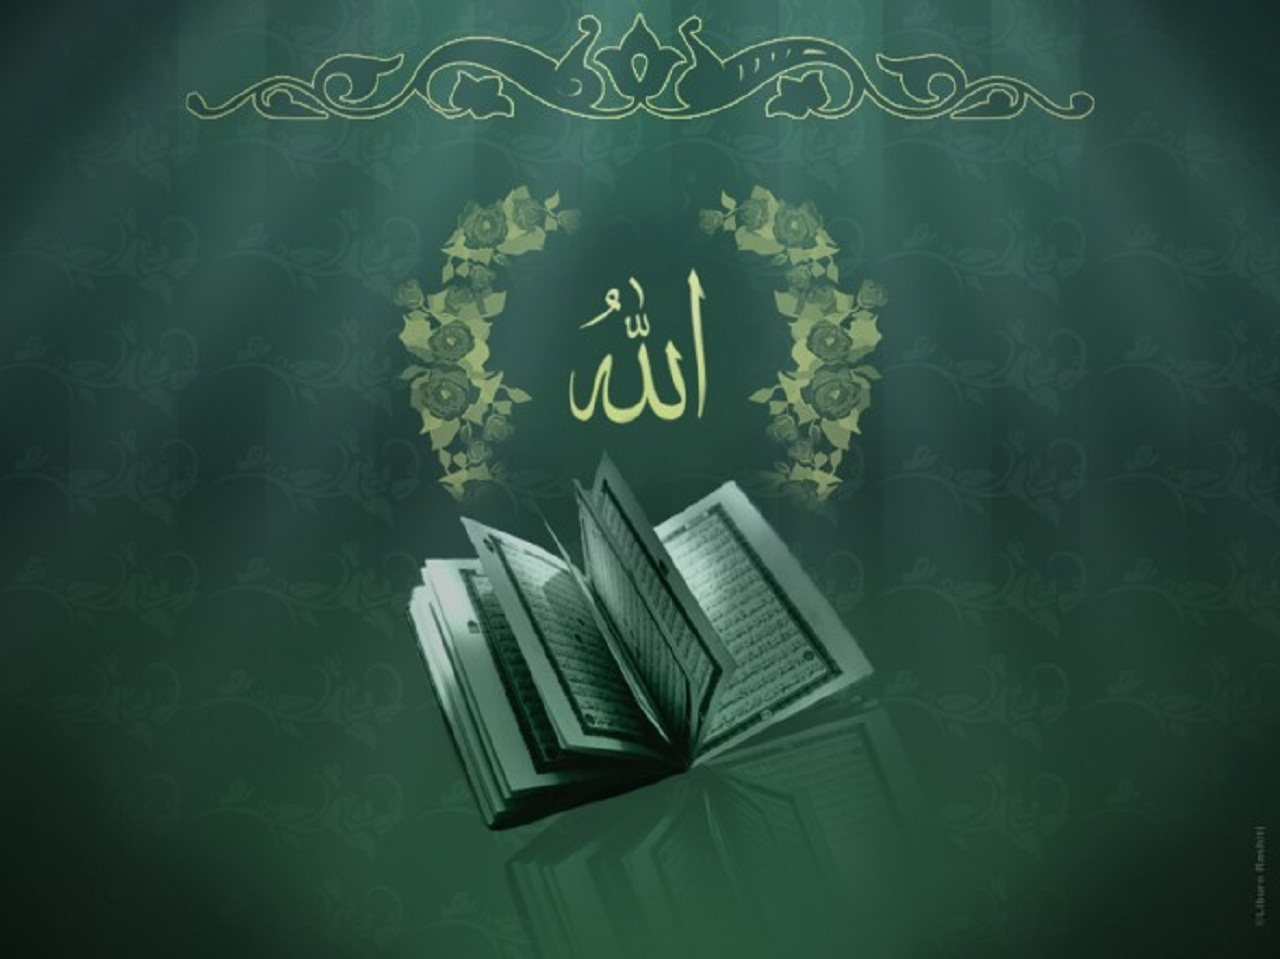 Islamic Wallpaper Allah Quran Green 690 517 Jpg Quran Wallpaper Islamic Wallpaper Allah Wallpaper